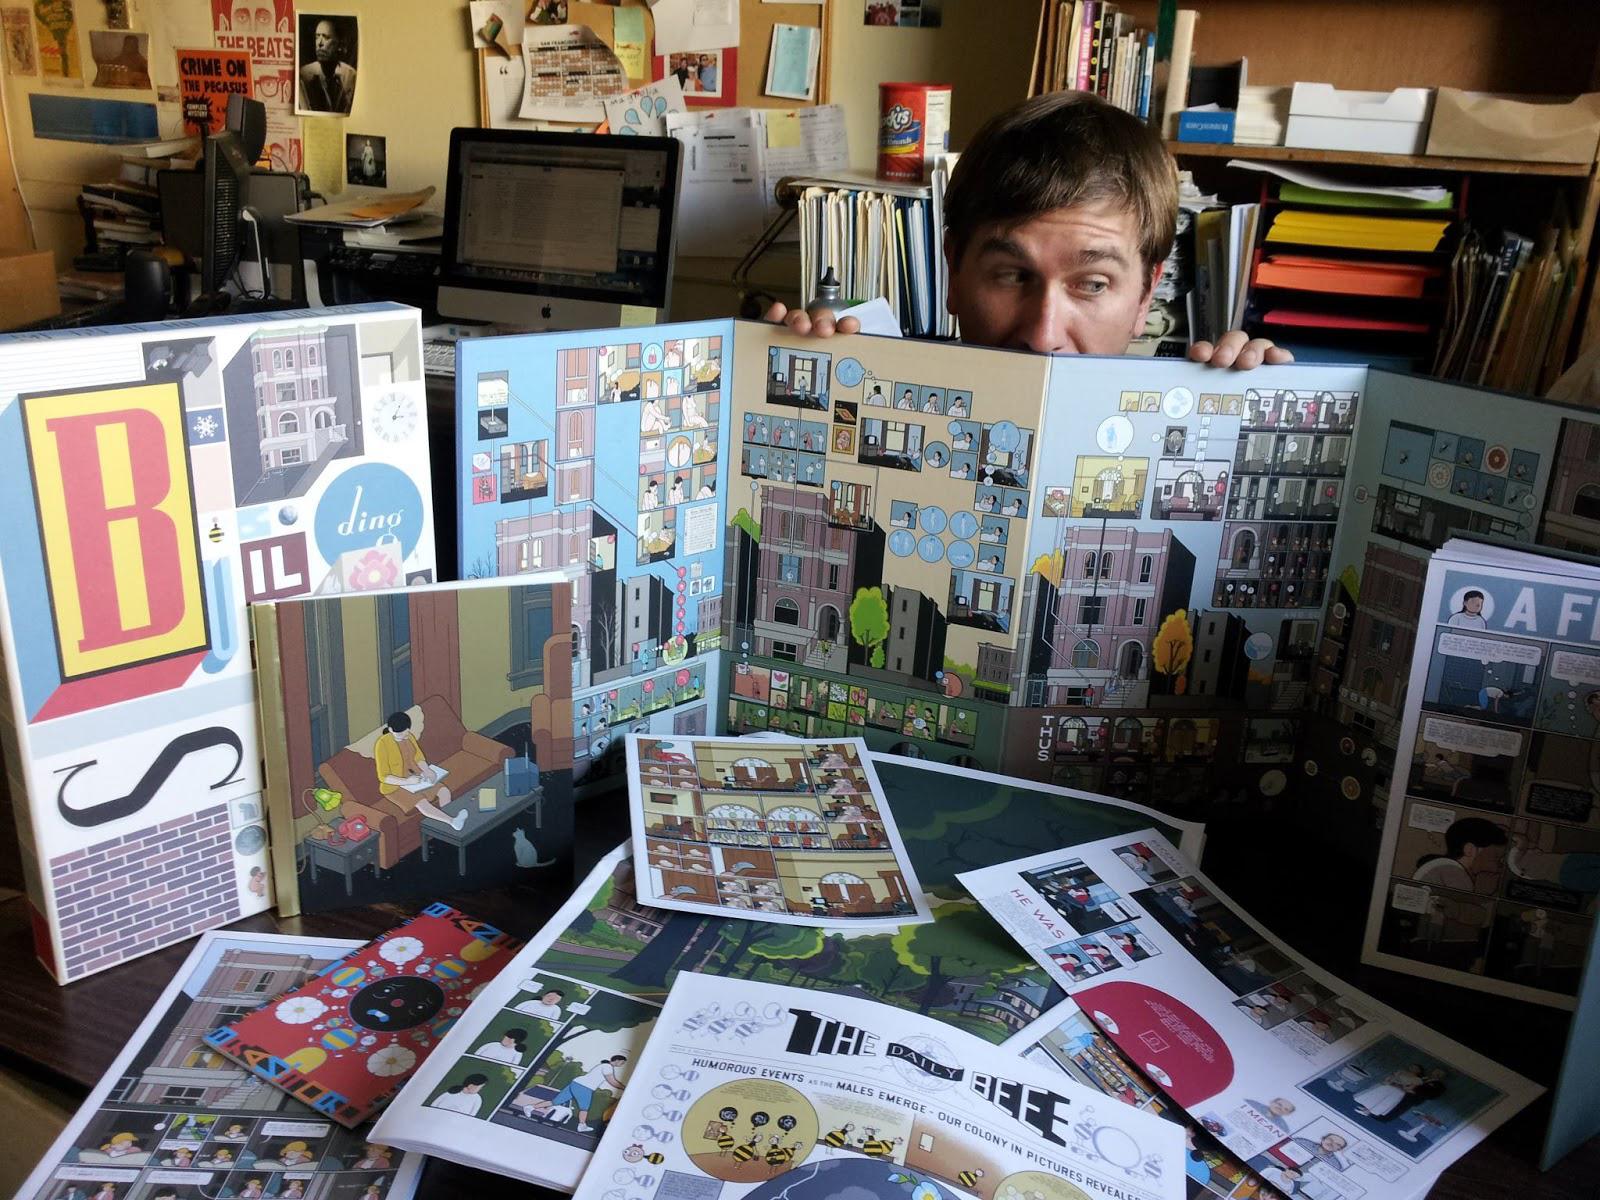 Building Stories de Chris Ware